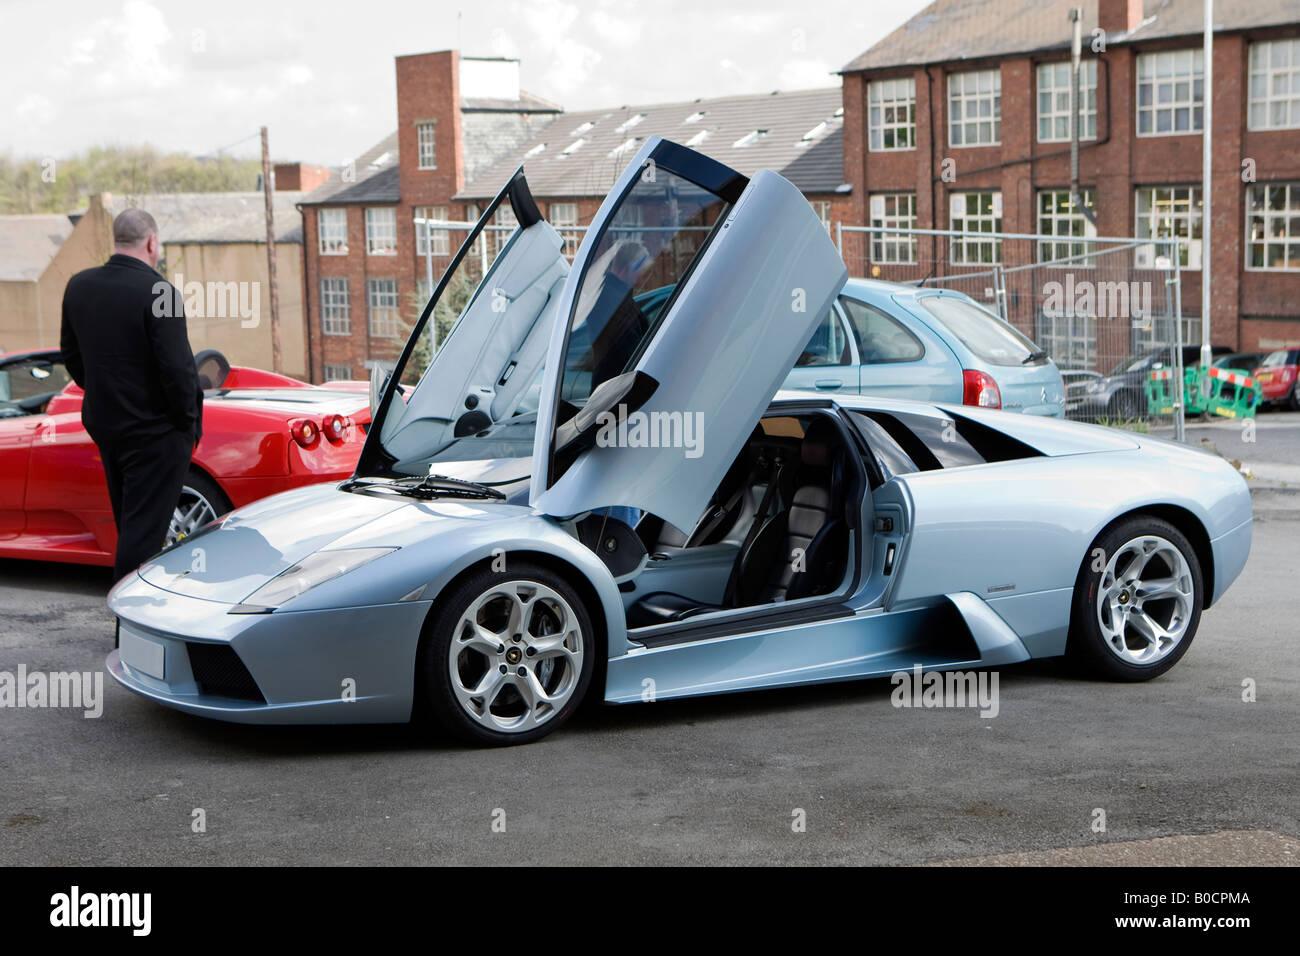 Lamborghini Murcielago Stockfotos Und Bilder Kaufen Seite 3 Alamy